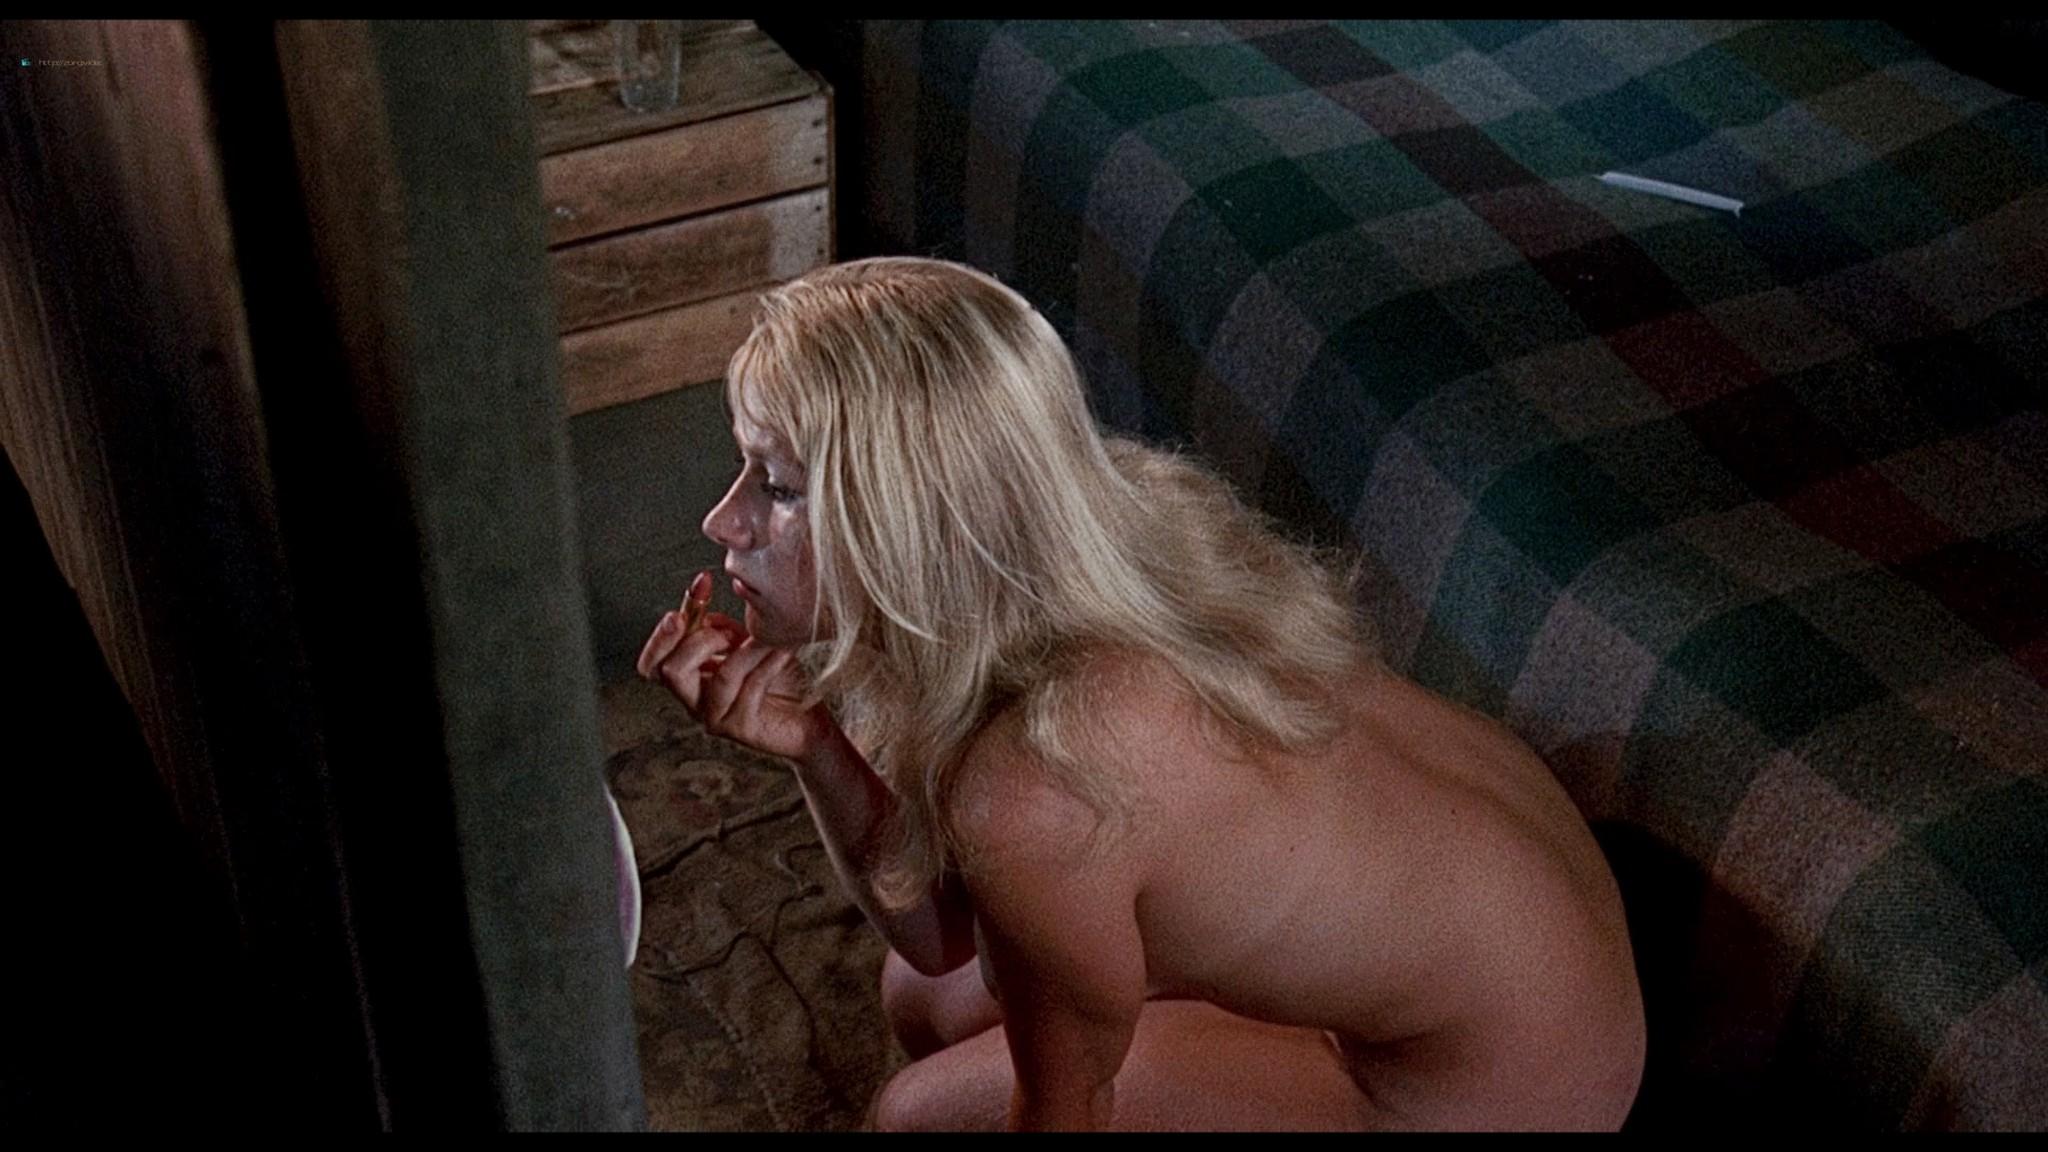 Helen Mirren nude skinny dipping Clarissa Kaye-Mason nude sex - Age of Consent (1969) HD 1080p BluRay Remux (16)